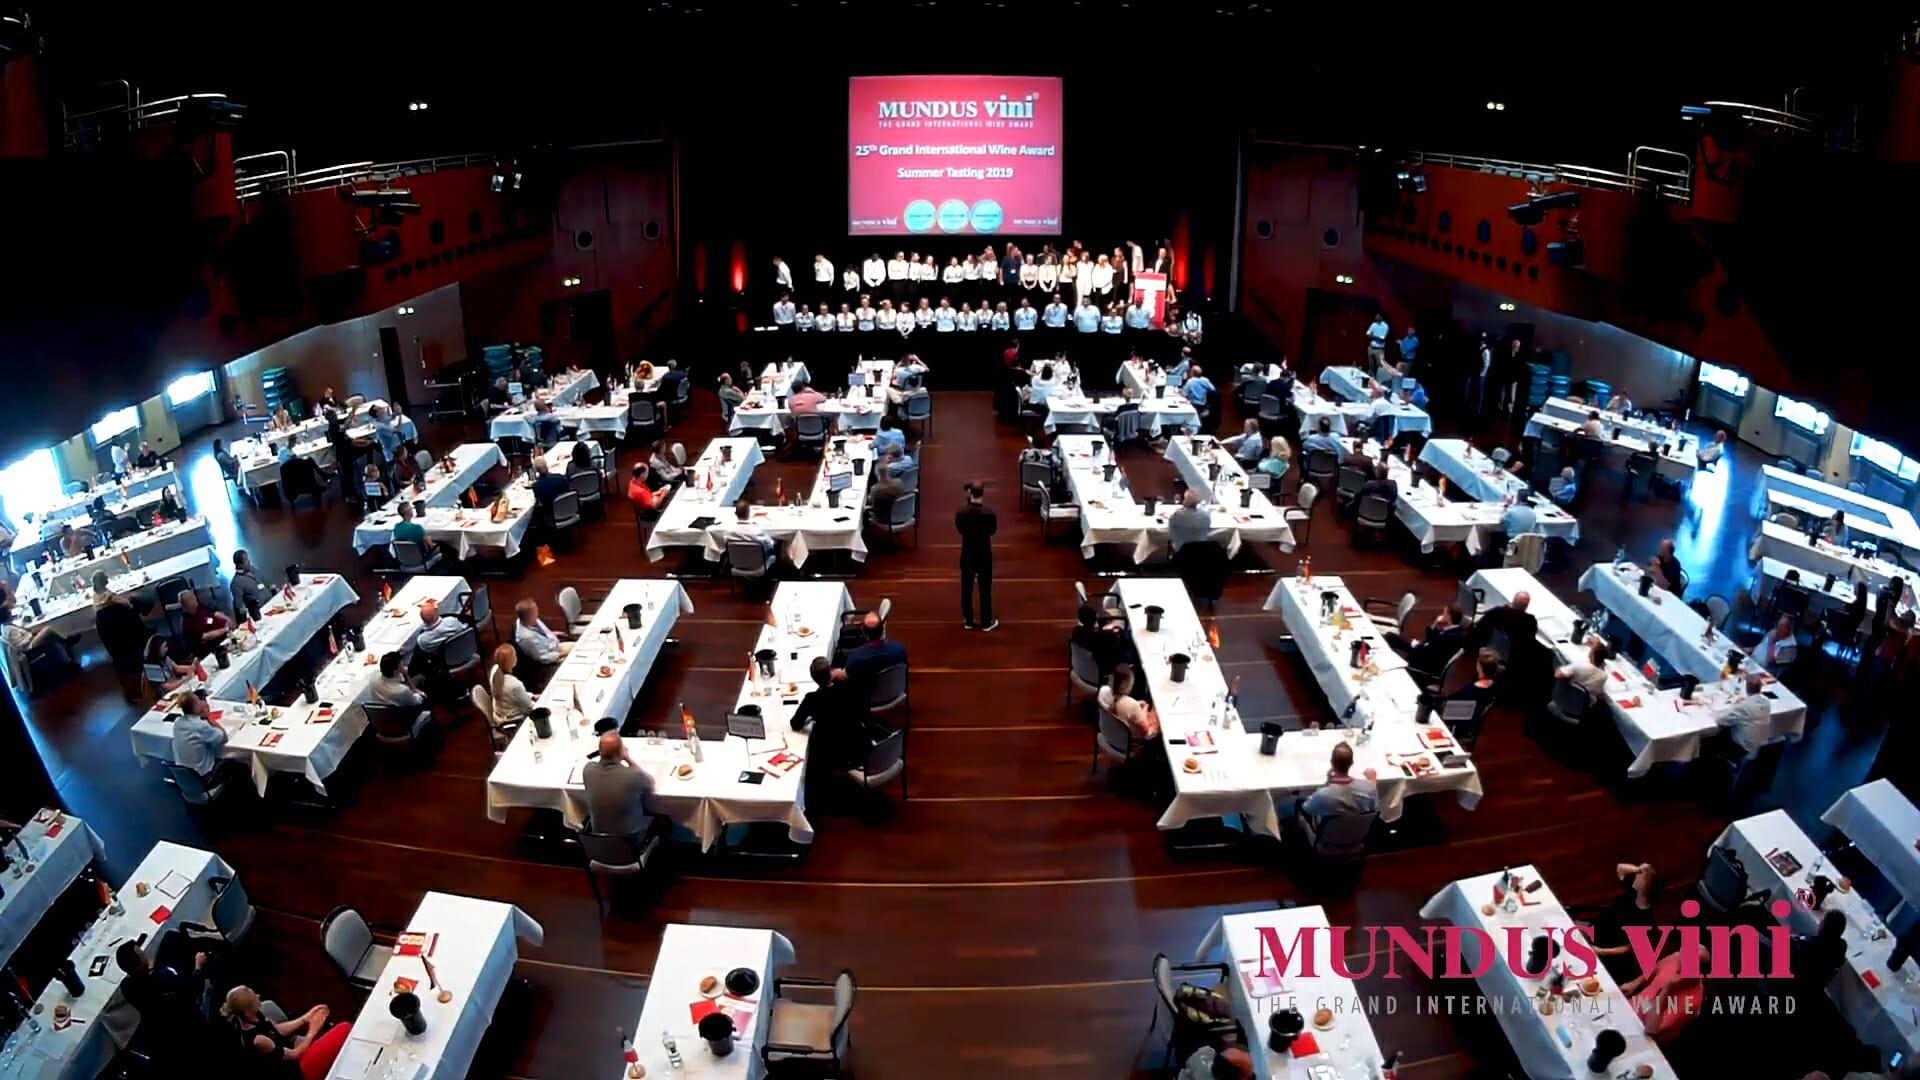 sala do concurso Mundus Vini Summer 2019